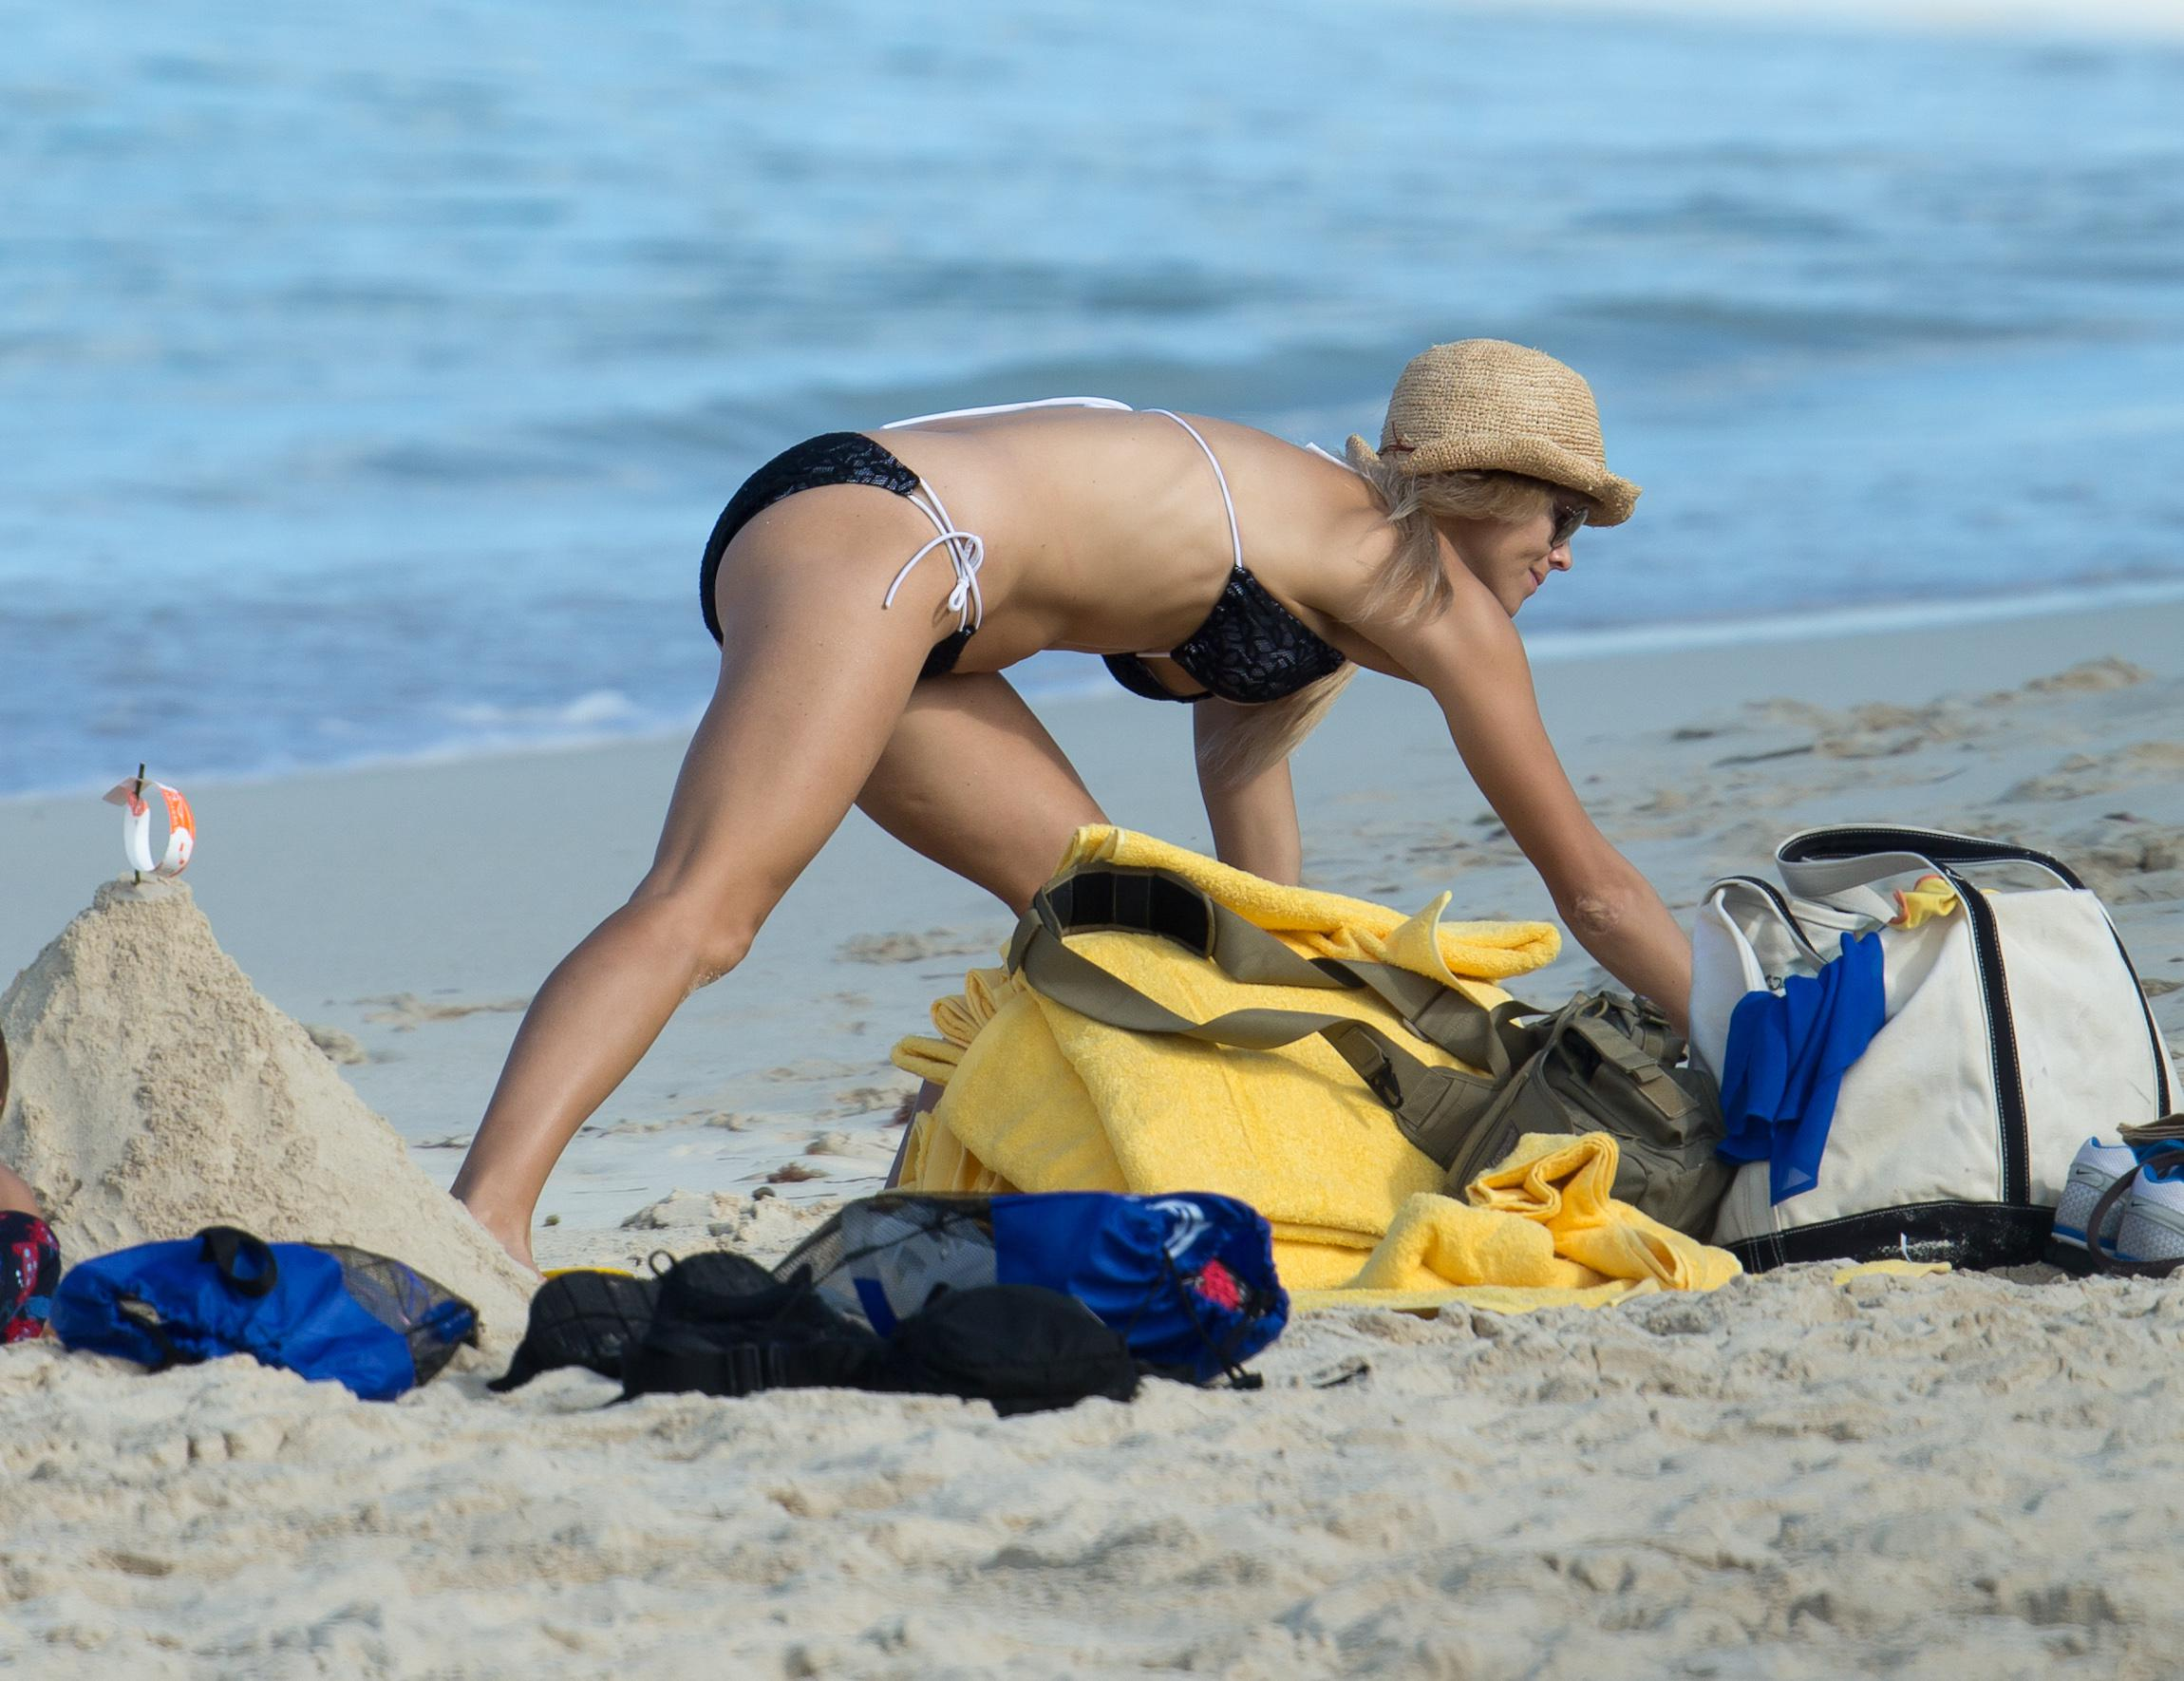 Bikini picture of elin nordegren